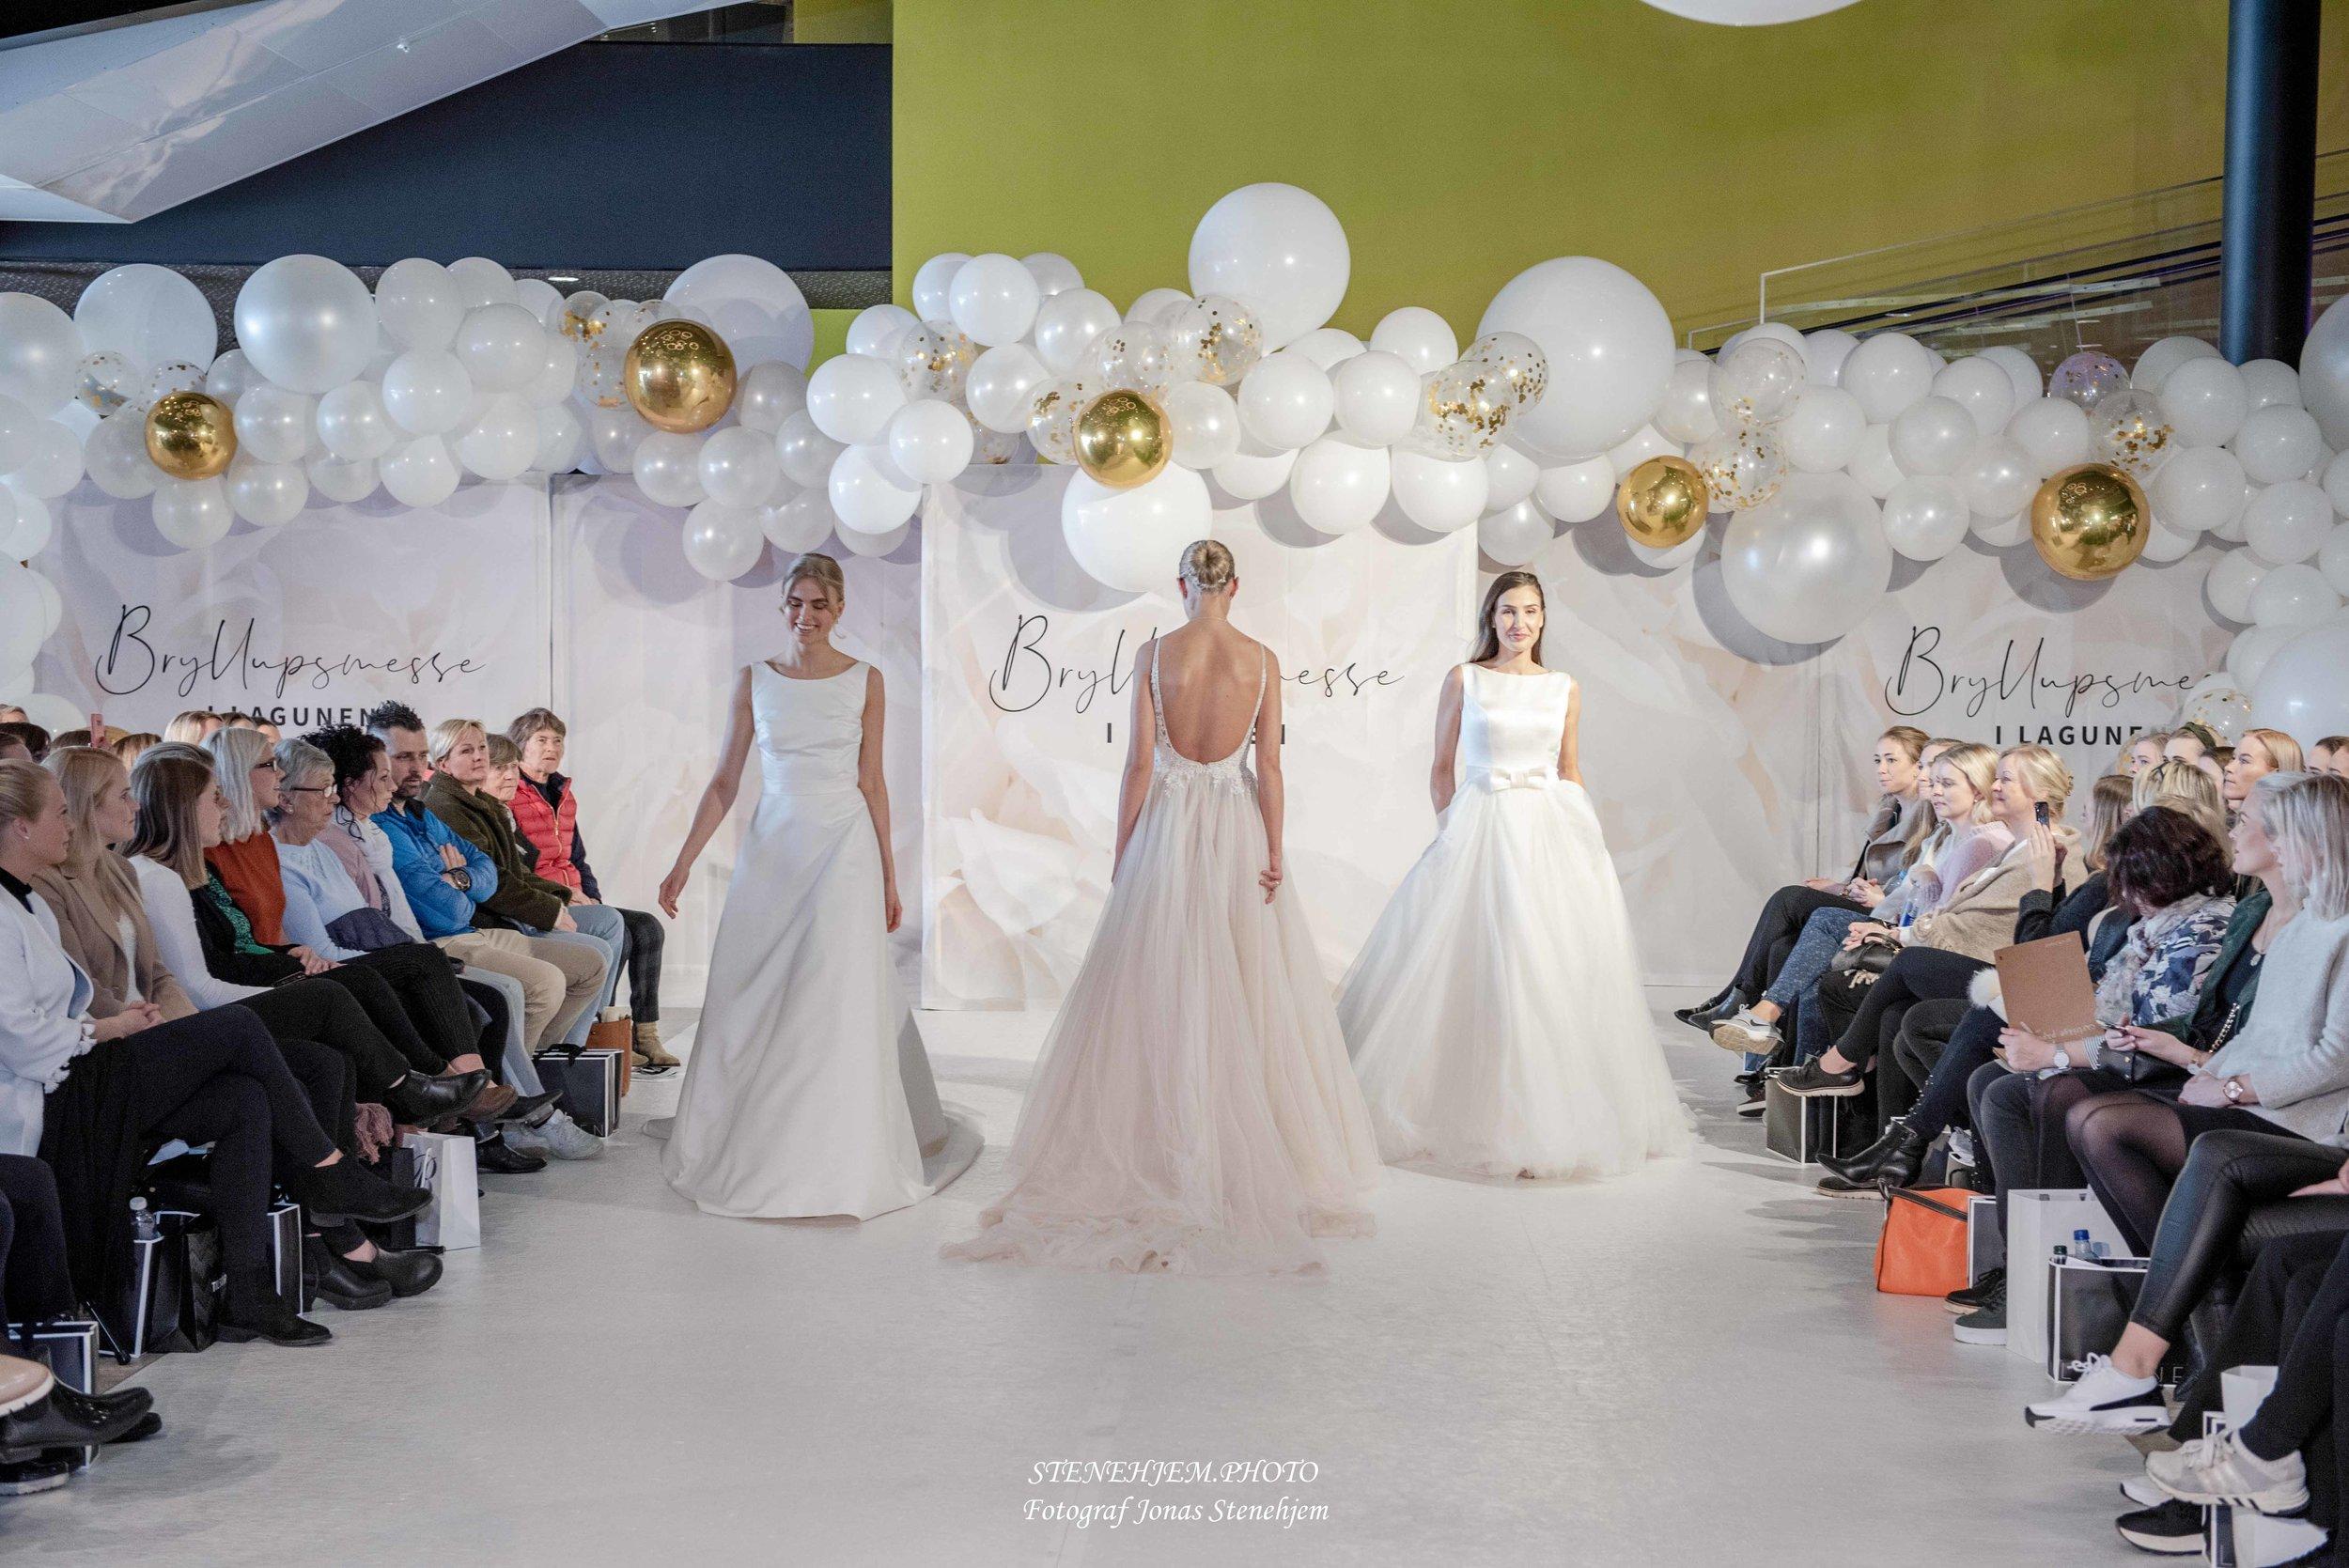 Bryllupsmesse_Lagunen_mittaltweddingfair__084.jpg